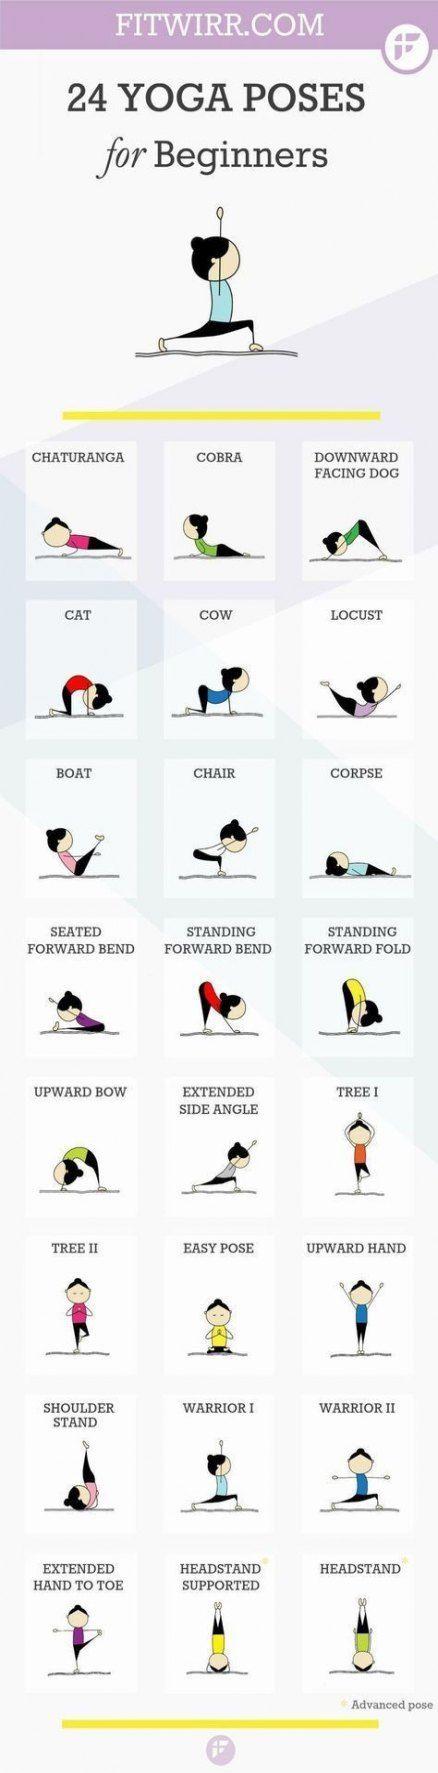 43 New Ideas Fitness Challenge Ideas Beginners Weight Loss #fitness